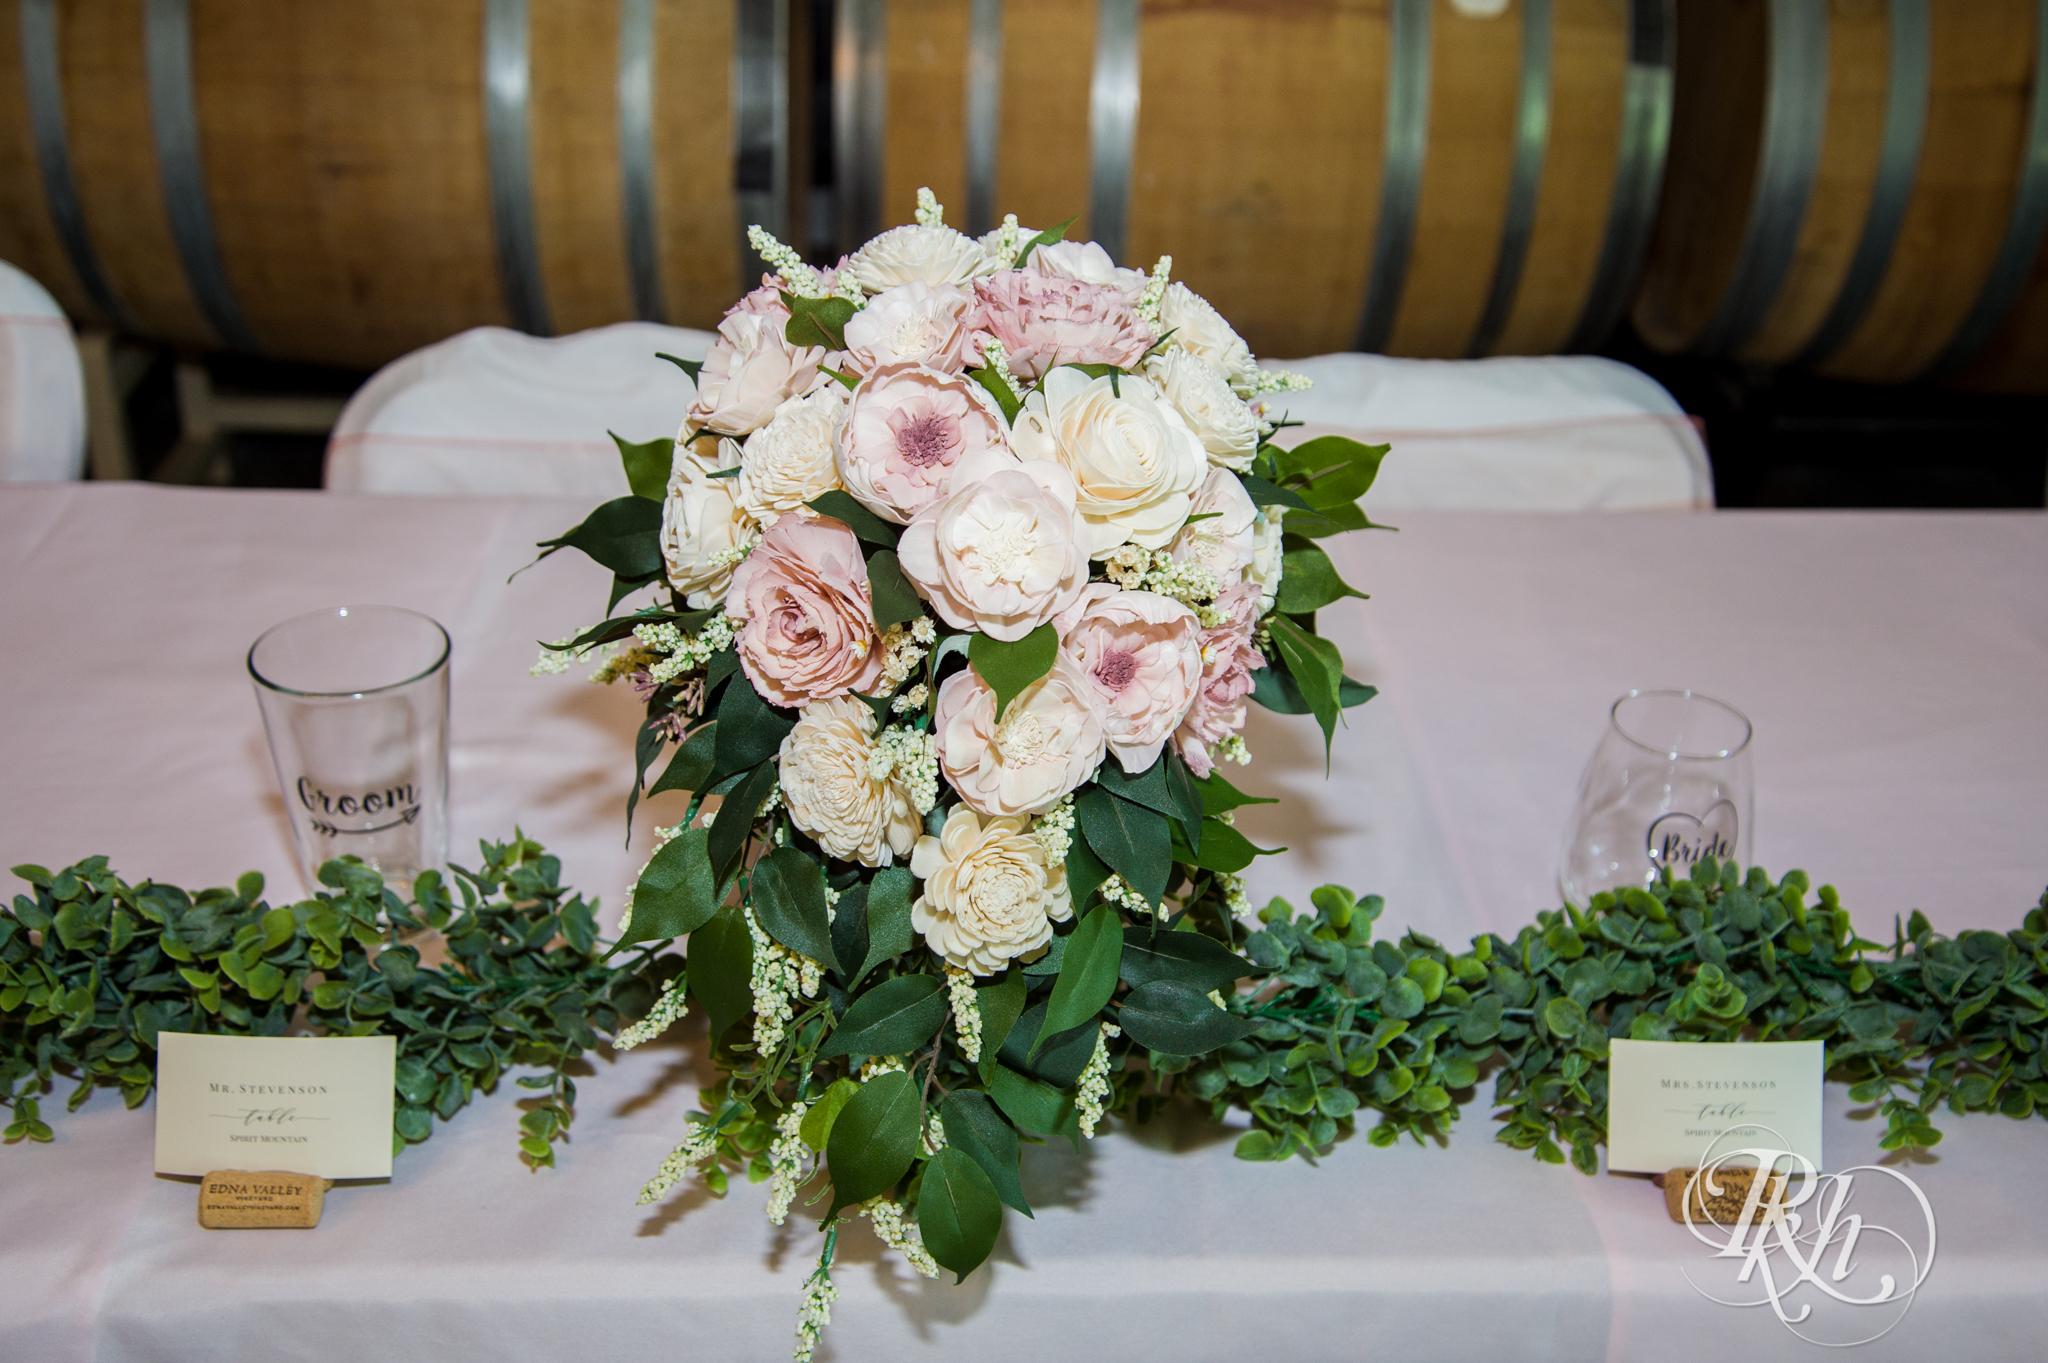 Ally & Nick - Minnesota Wedding Photography - Next Chapter Winery - RKH Images - Blog (6 of 57).jpg